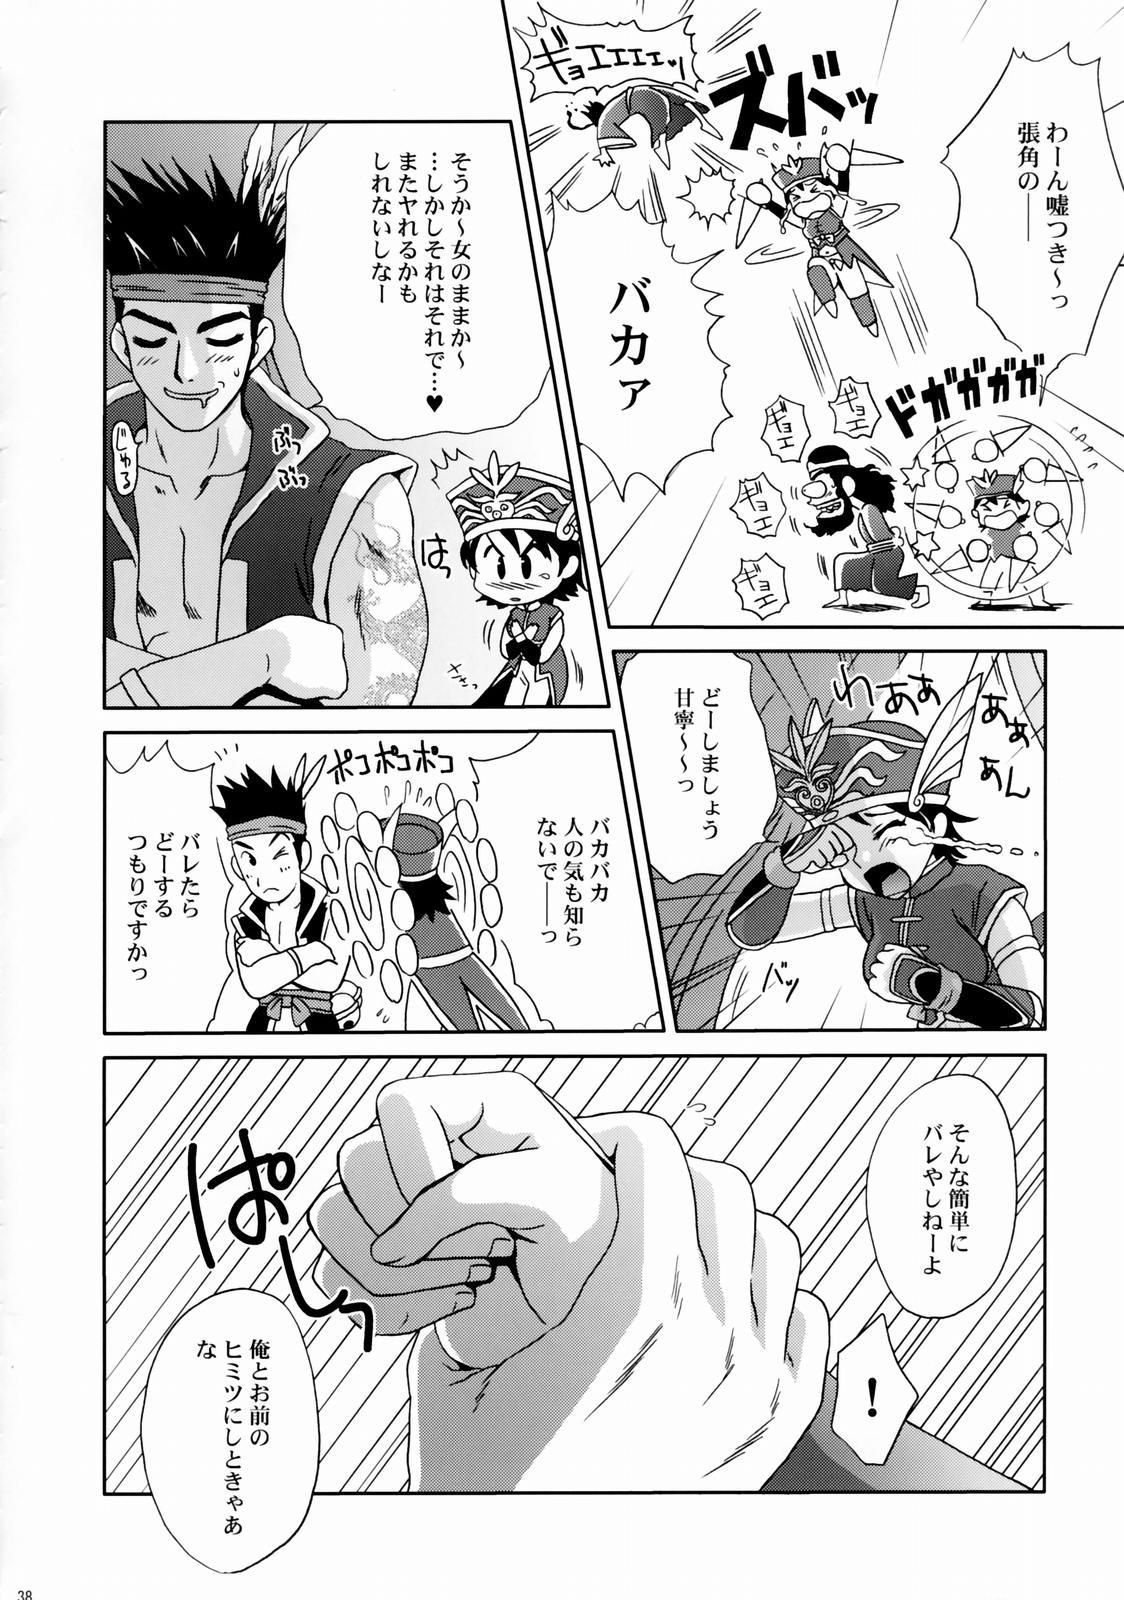 In Sangoku Musou Rikuson Gaiden 36